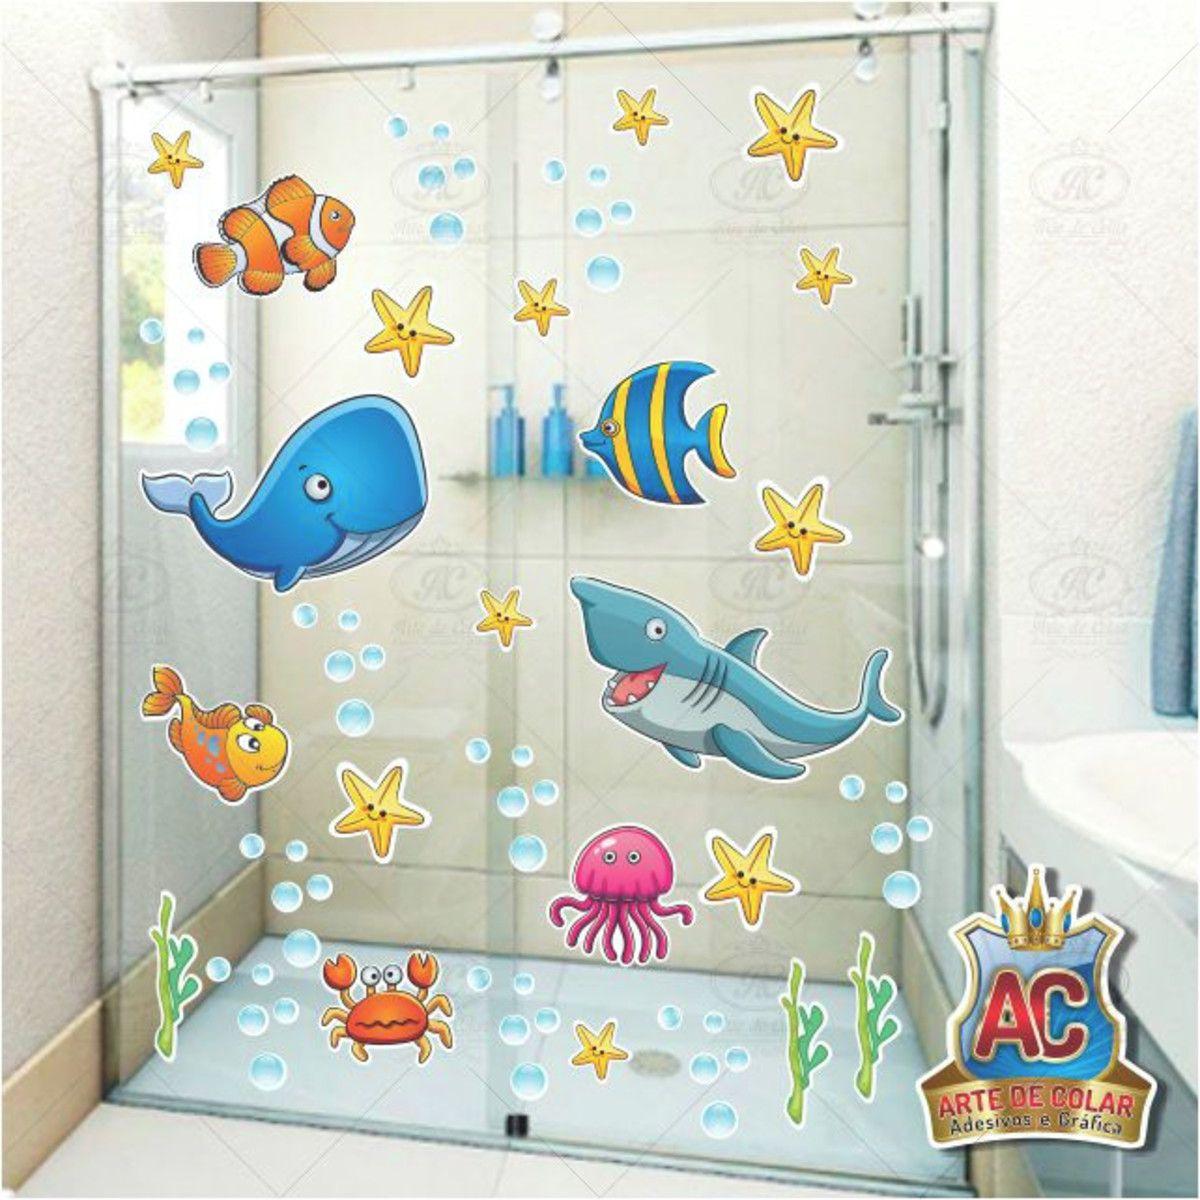 Adesivo Infantil Box Banheiro Peixes Fundo Do Mar 80x50cm